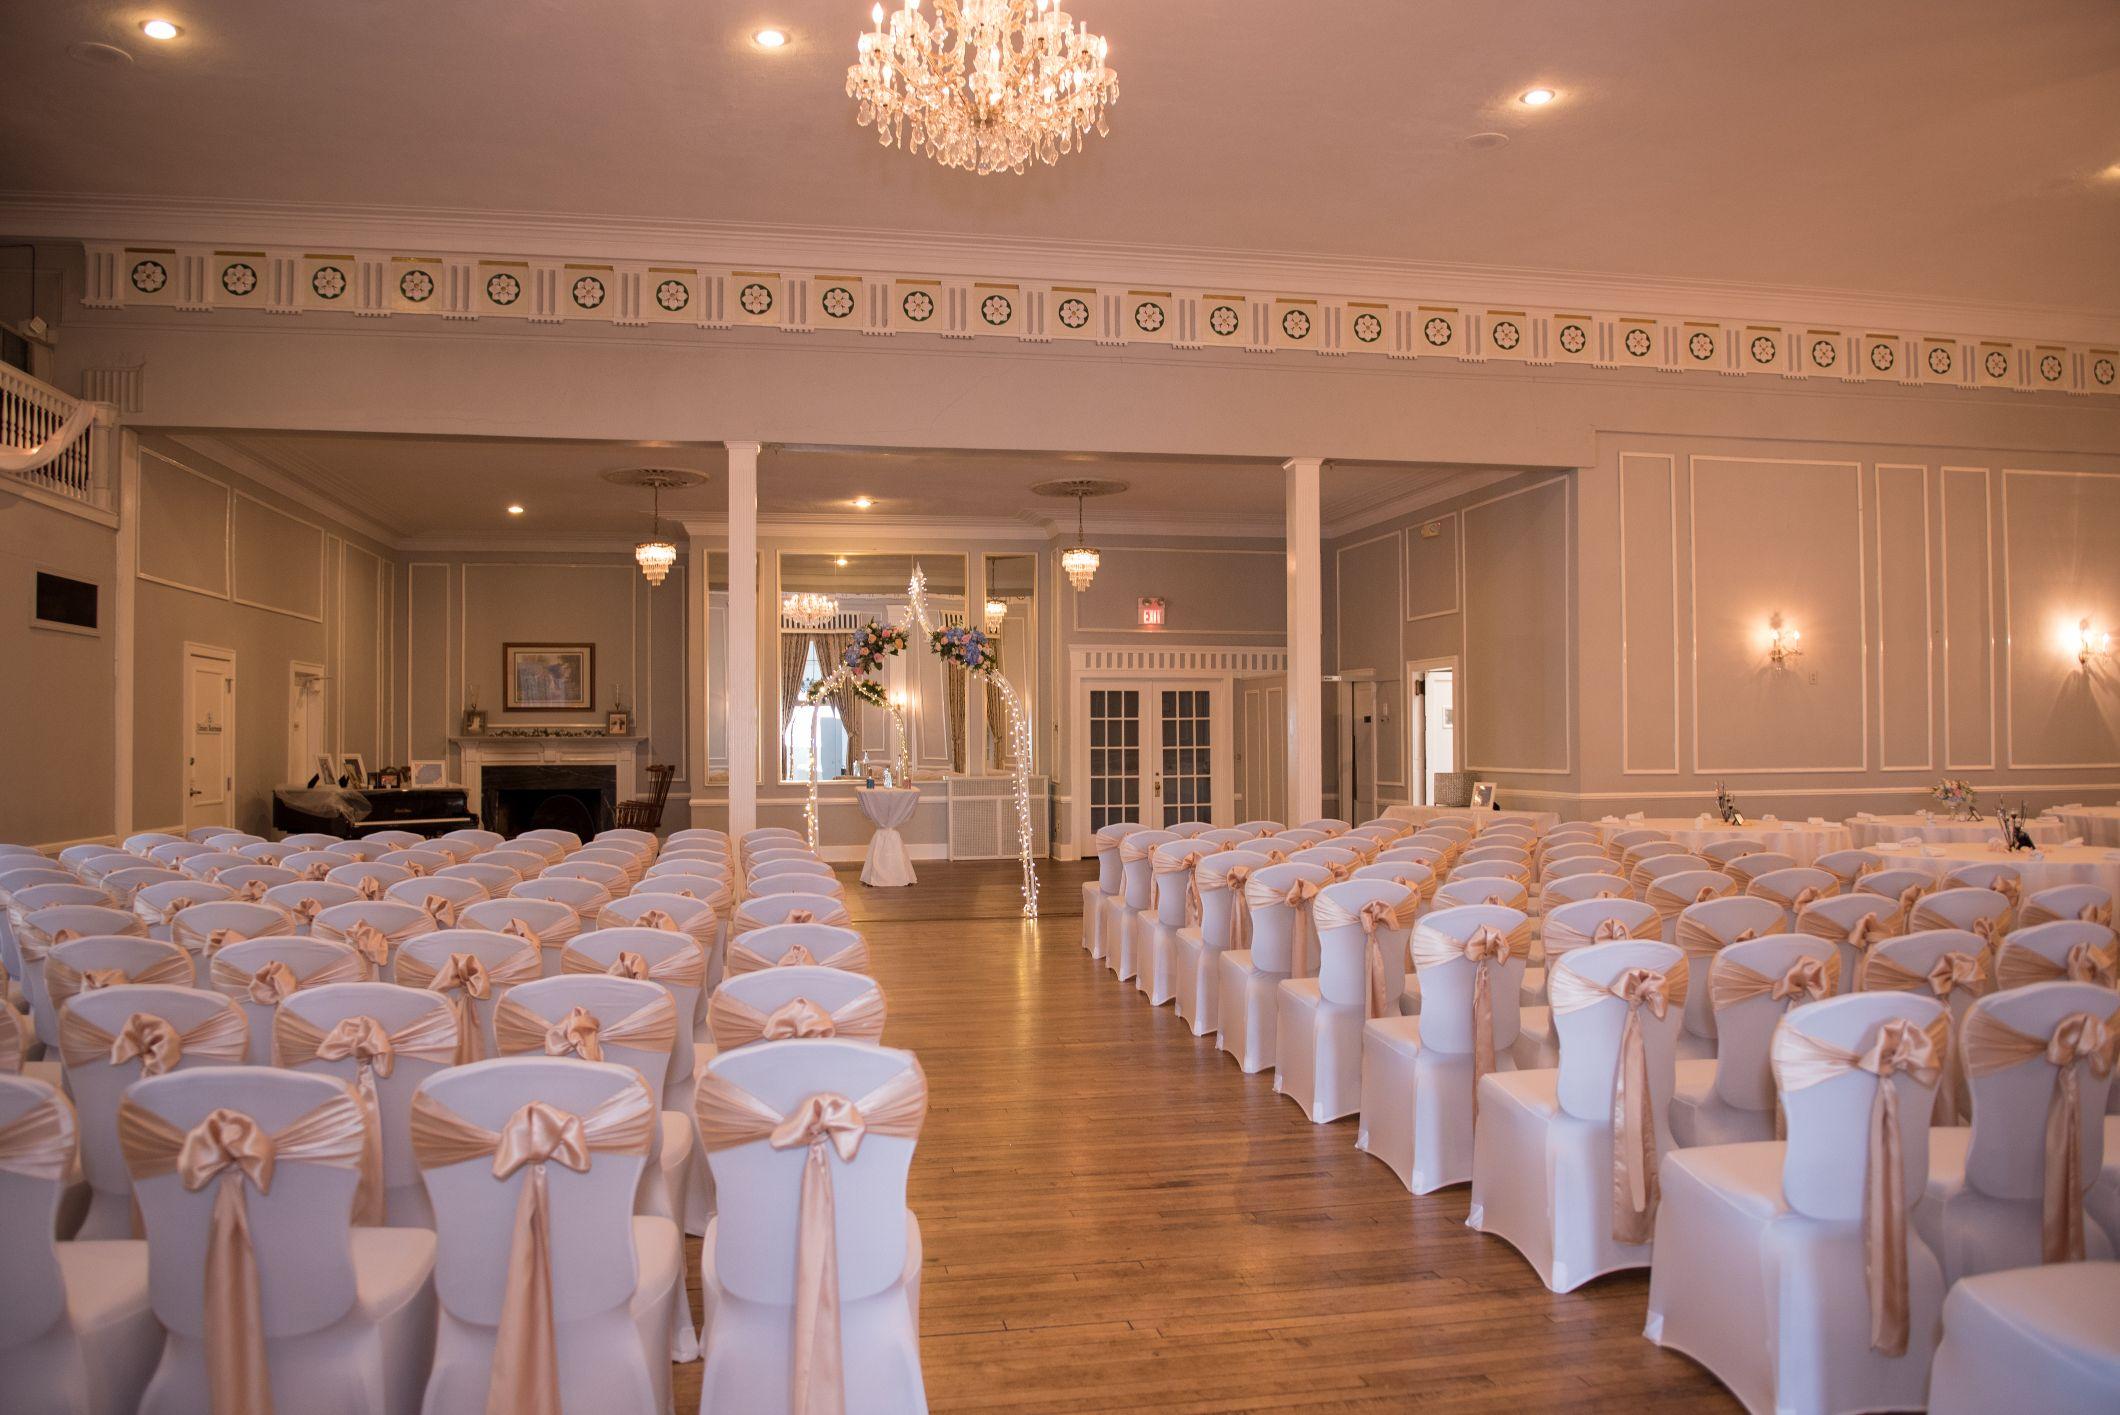 meeting house grand ballroom ceremony space